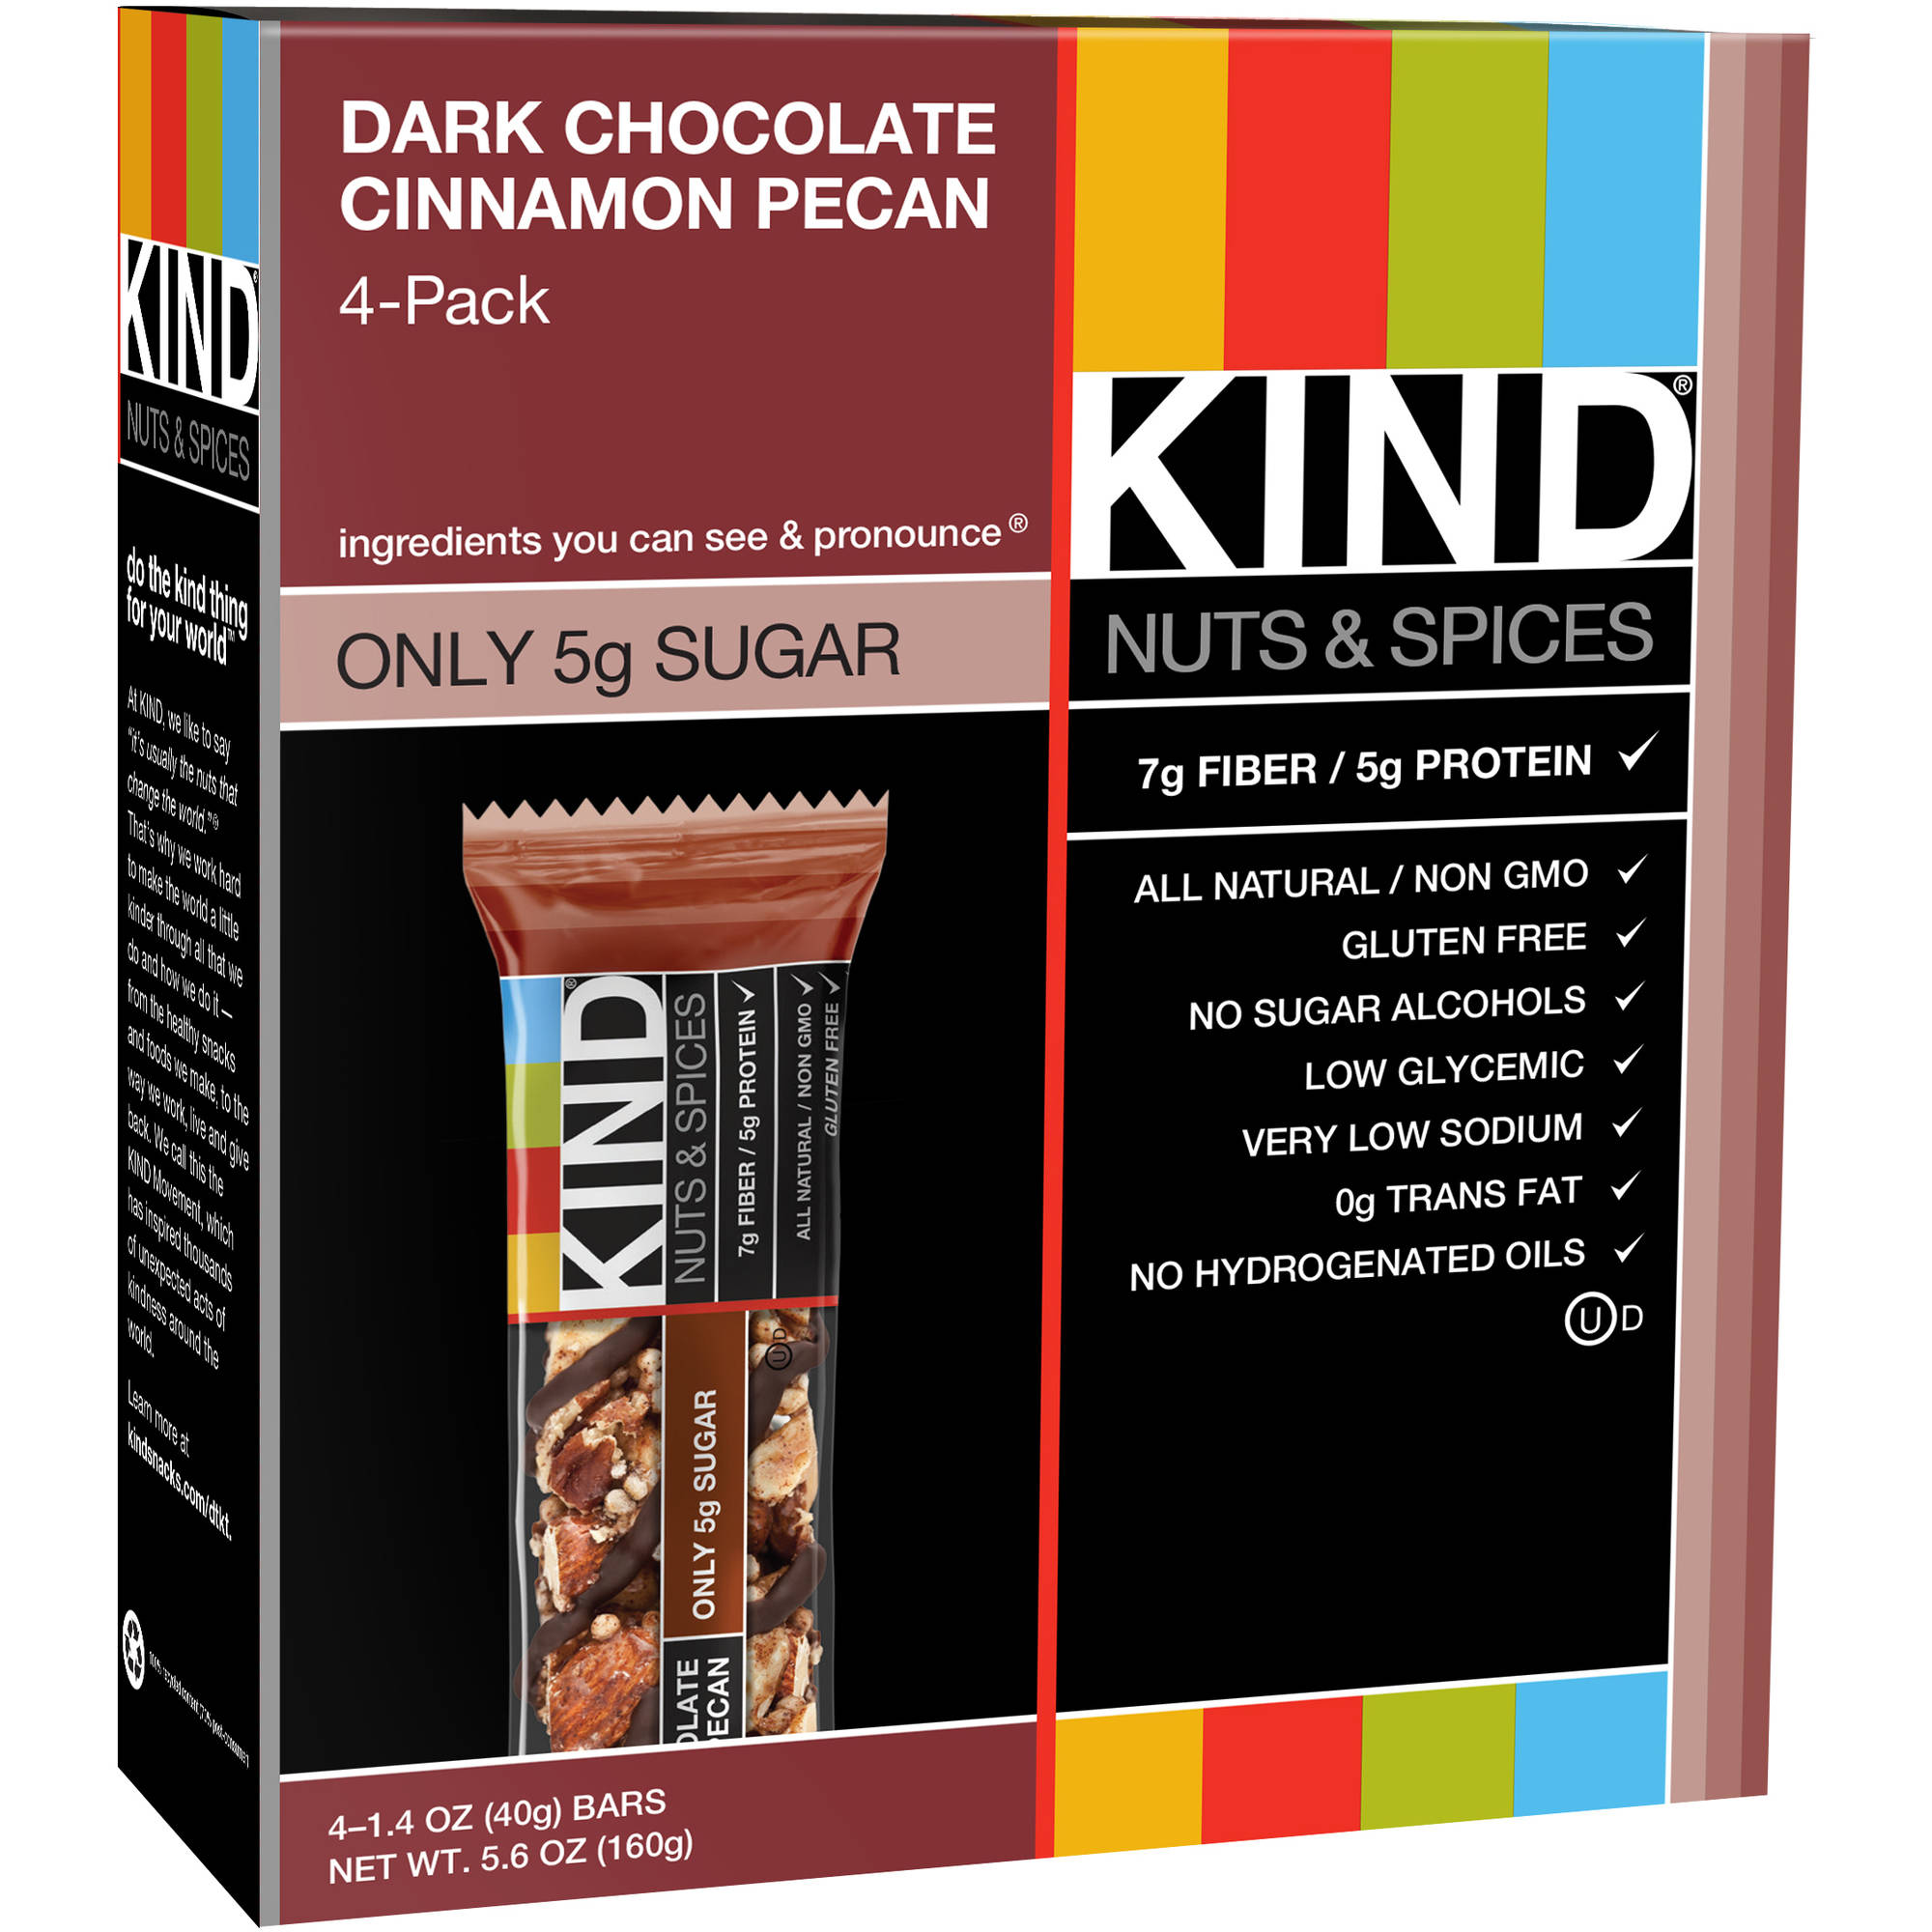 KIND Nuts & Spices Bars, Dark Chocolate Cinnamon Pecan, 1.4 Ounces, 4 Count